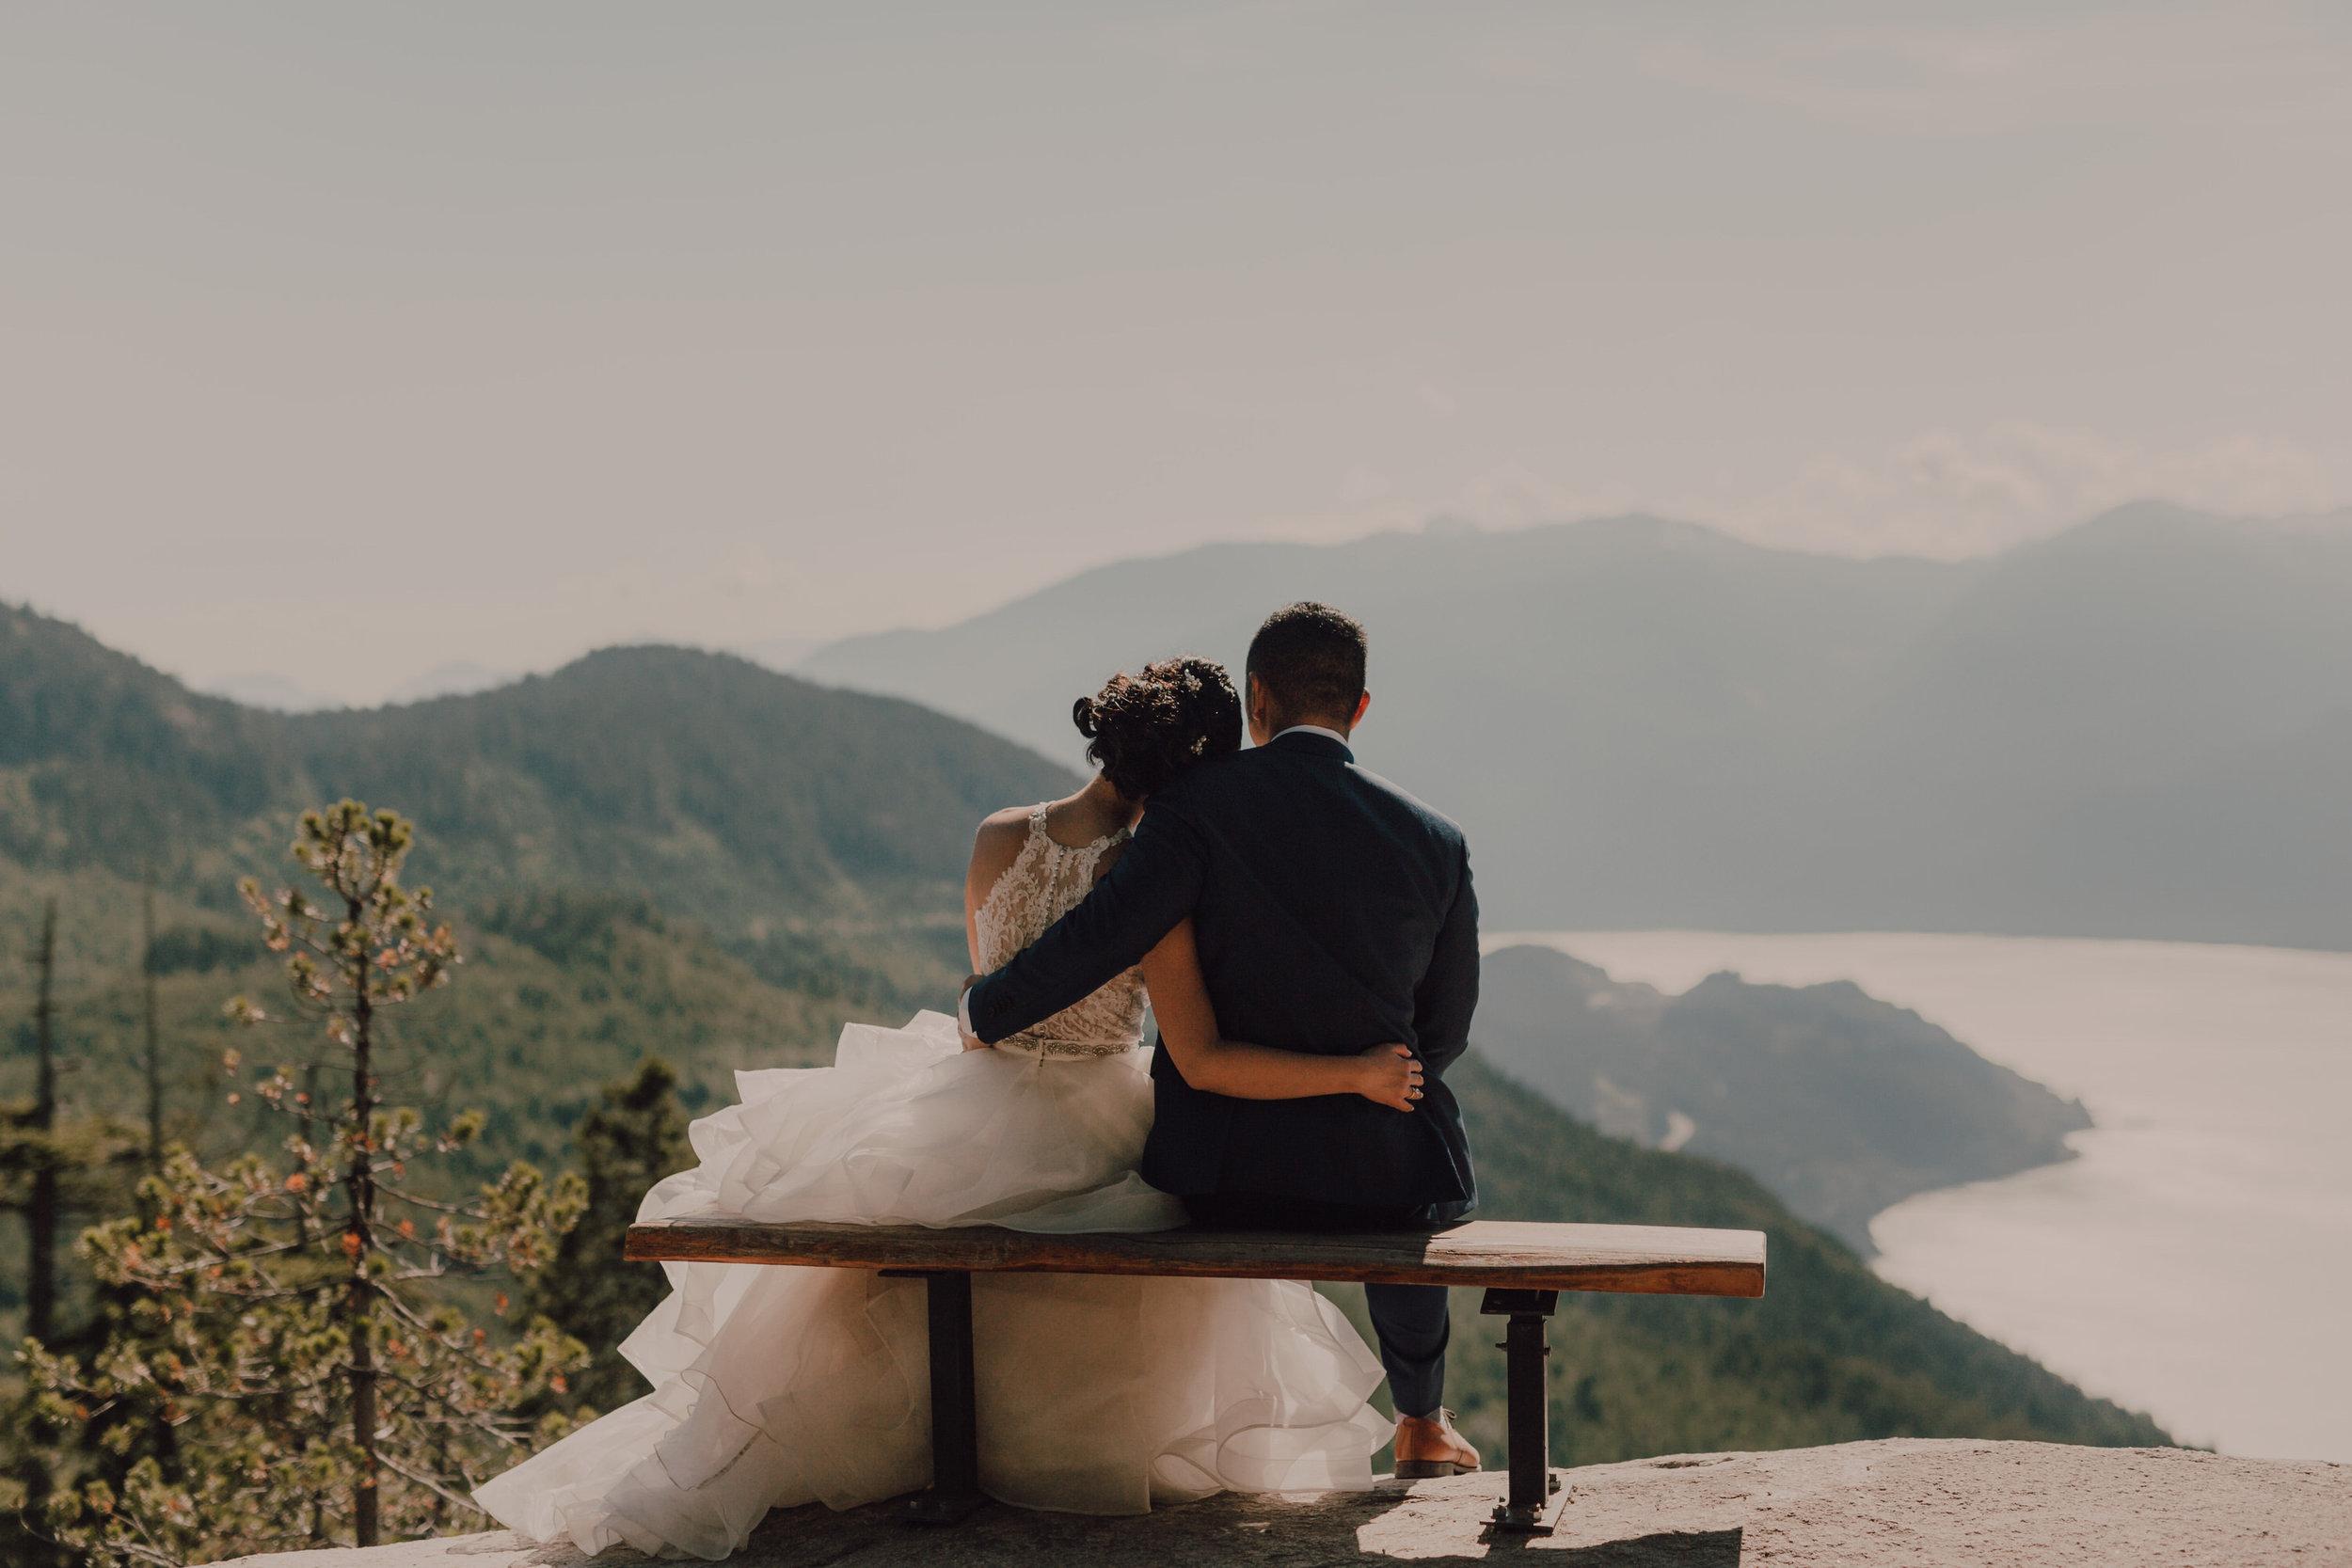 Squamish Wedding Photographer - Sea to Sky Gondola Wedding Photos -  Vancouver Wedding Photographer & Videographer - Sunshine Coast Wedding Photos - Sunshine Coast Wedding Photographer - Jennifer Picard Photography - IMG_3598.jpg